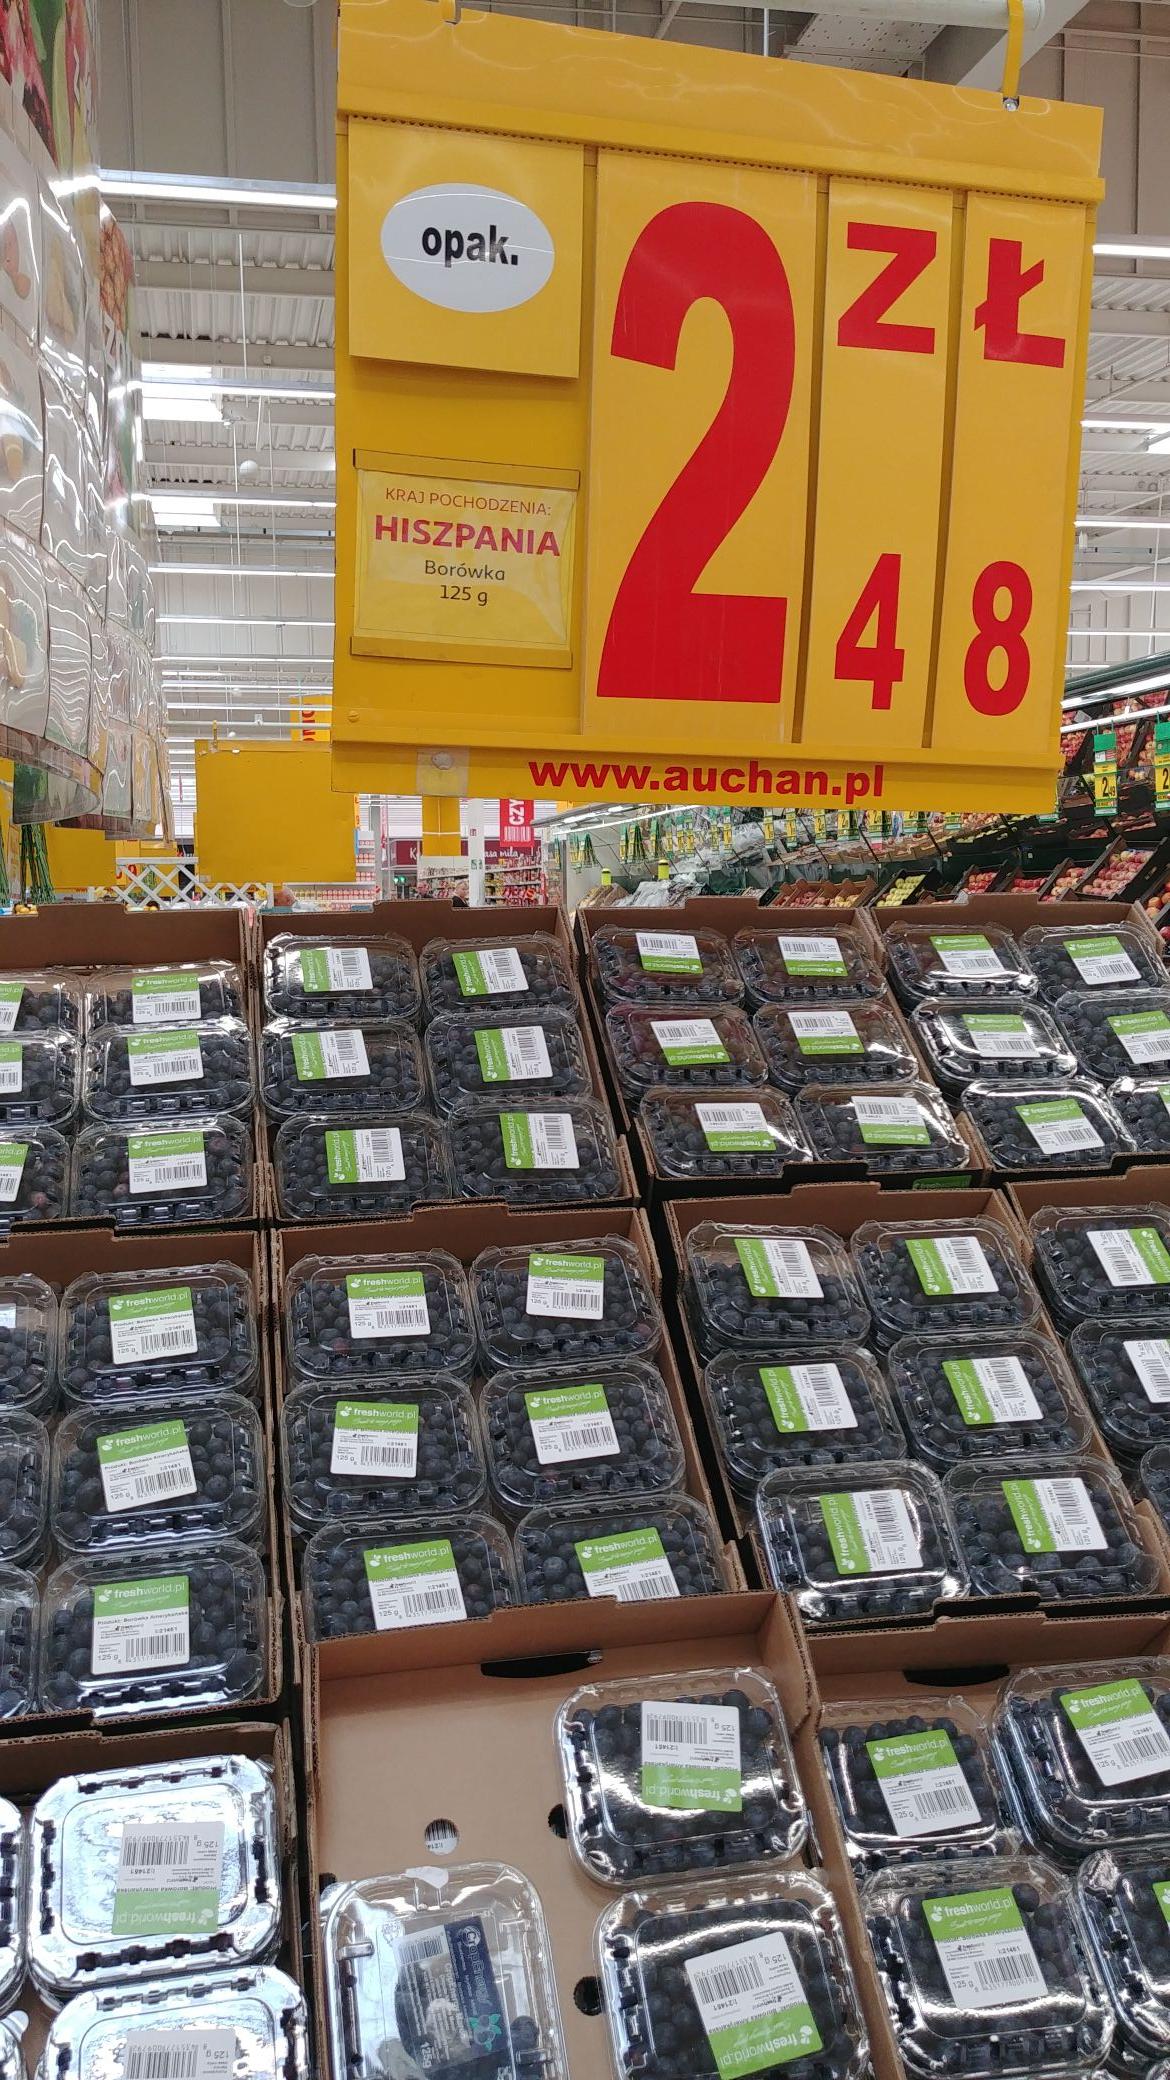 Auchan: Borówka amerykańska 2,48